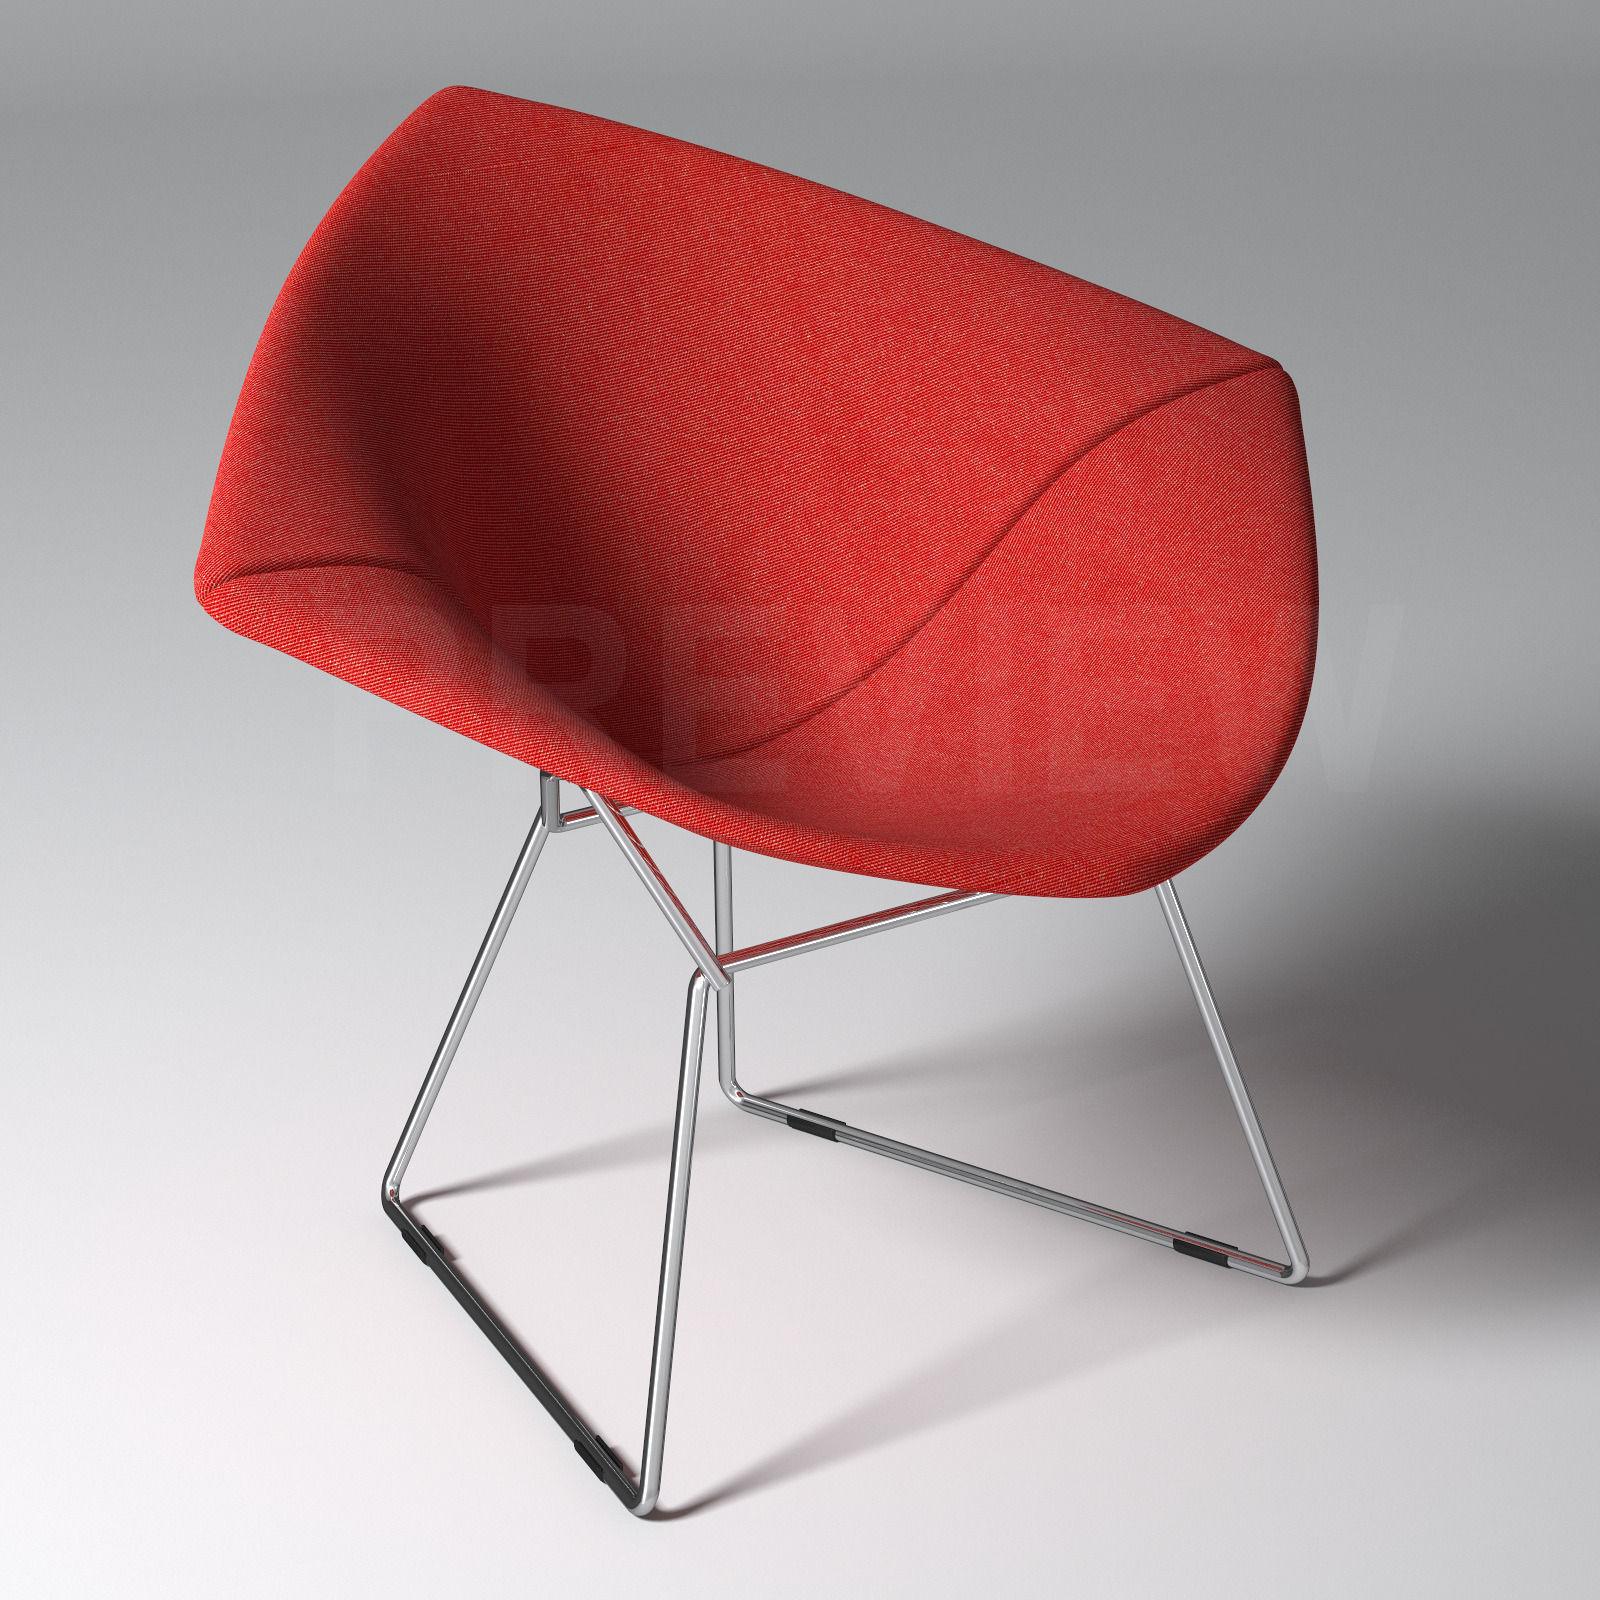 Charmant Bertoia Diamond Armchair With Full Cover   Knoll 3D Model